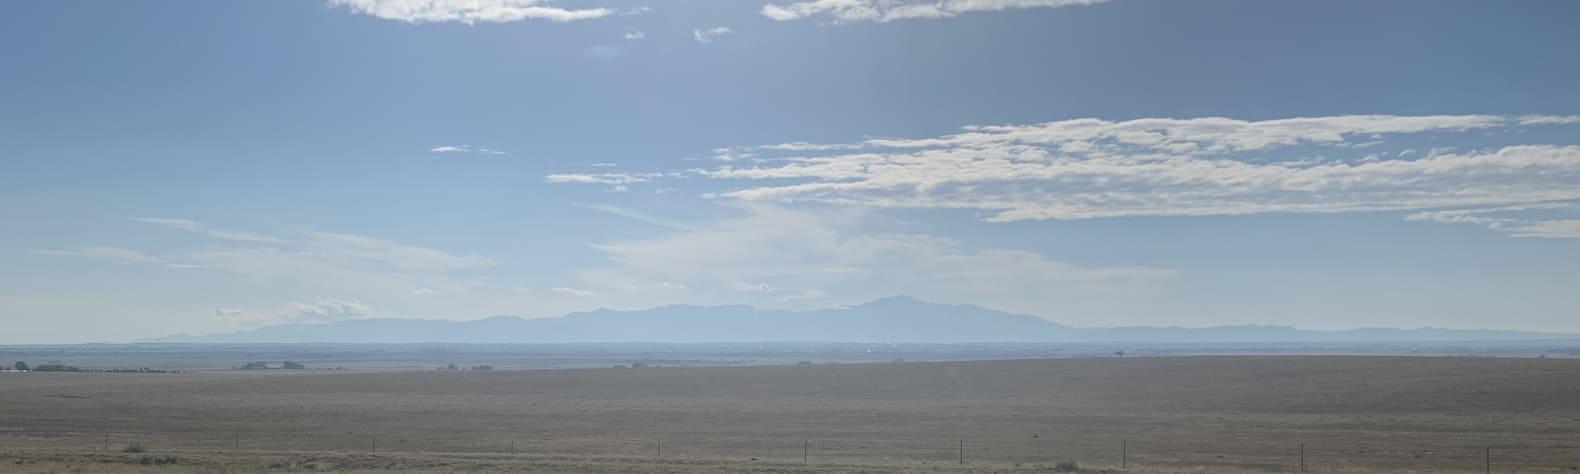 Kyle W.'s Land